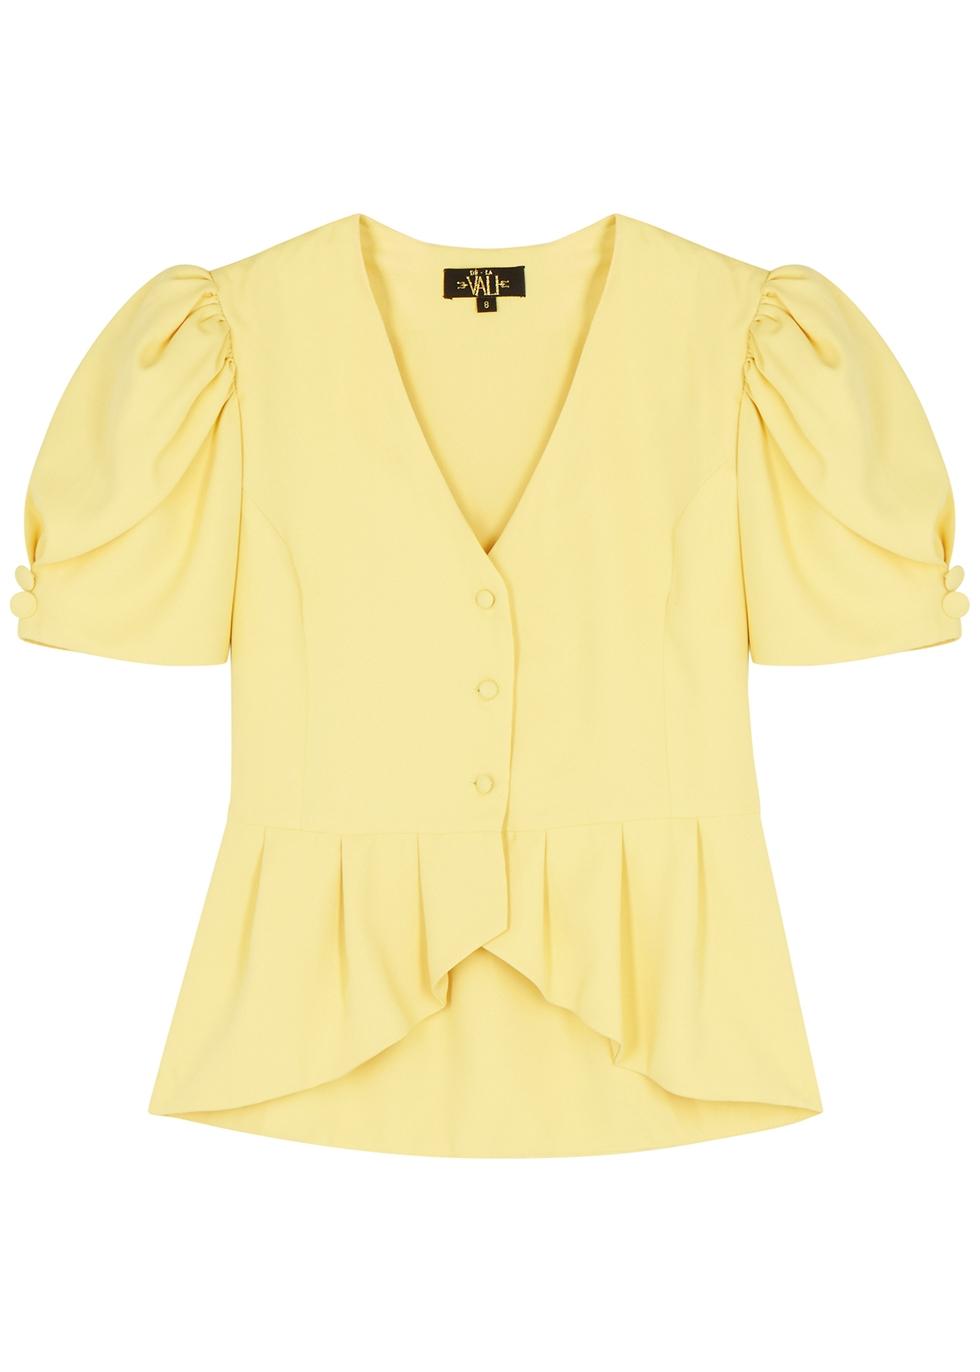 Dylan yellow peplum blouse